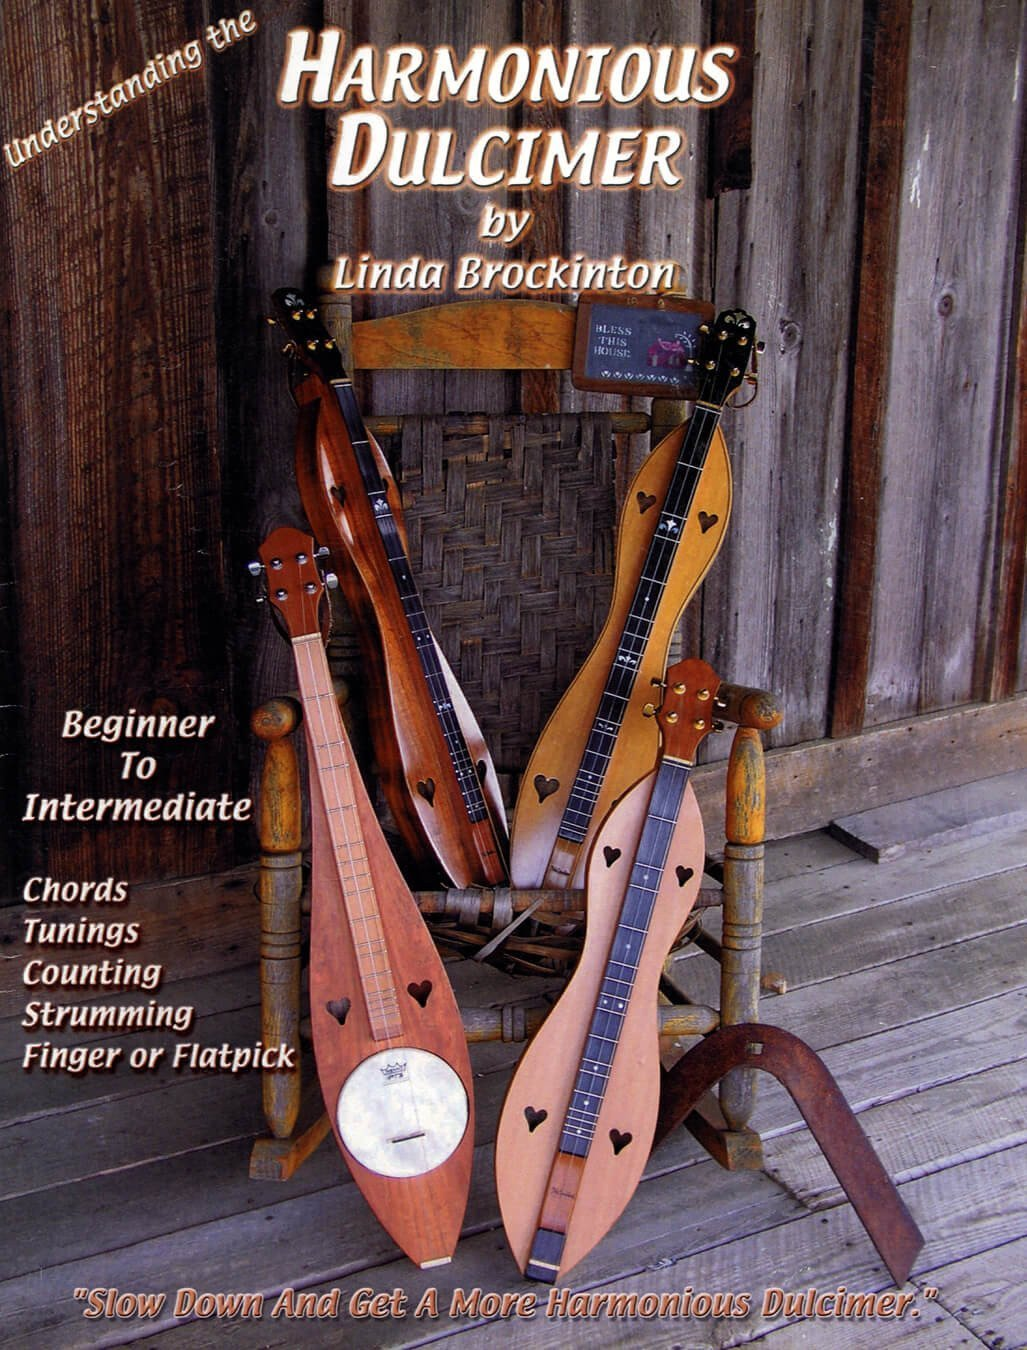 Linda Brockinton - Understanding The Harmonious Dulcimer